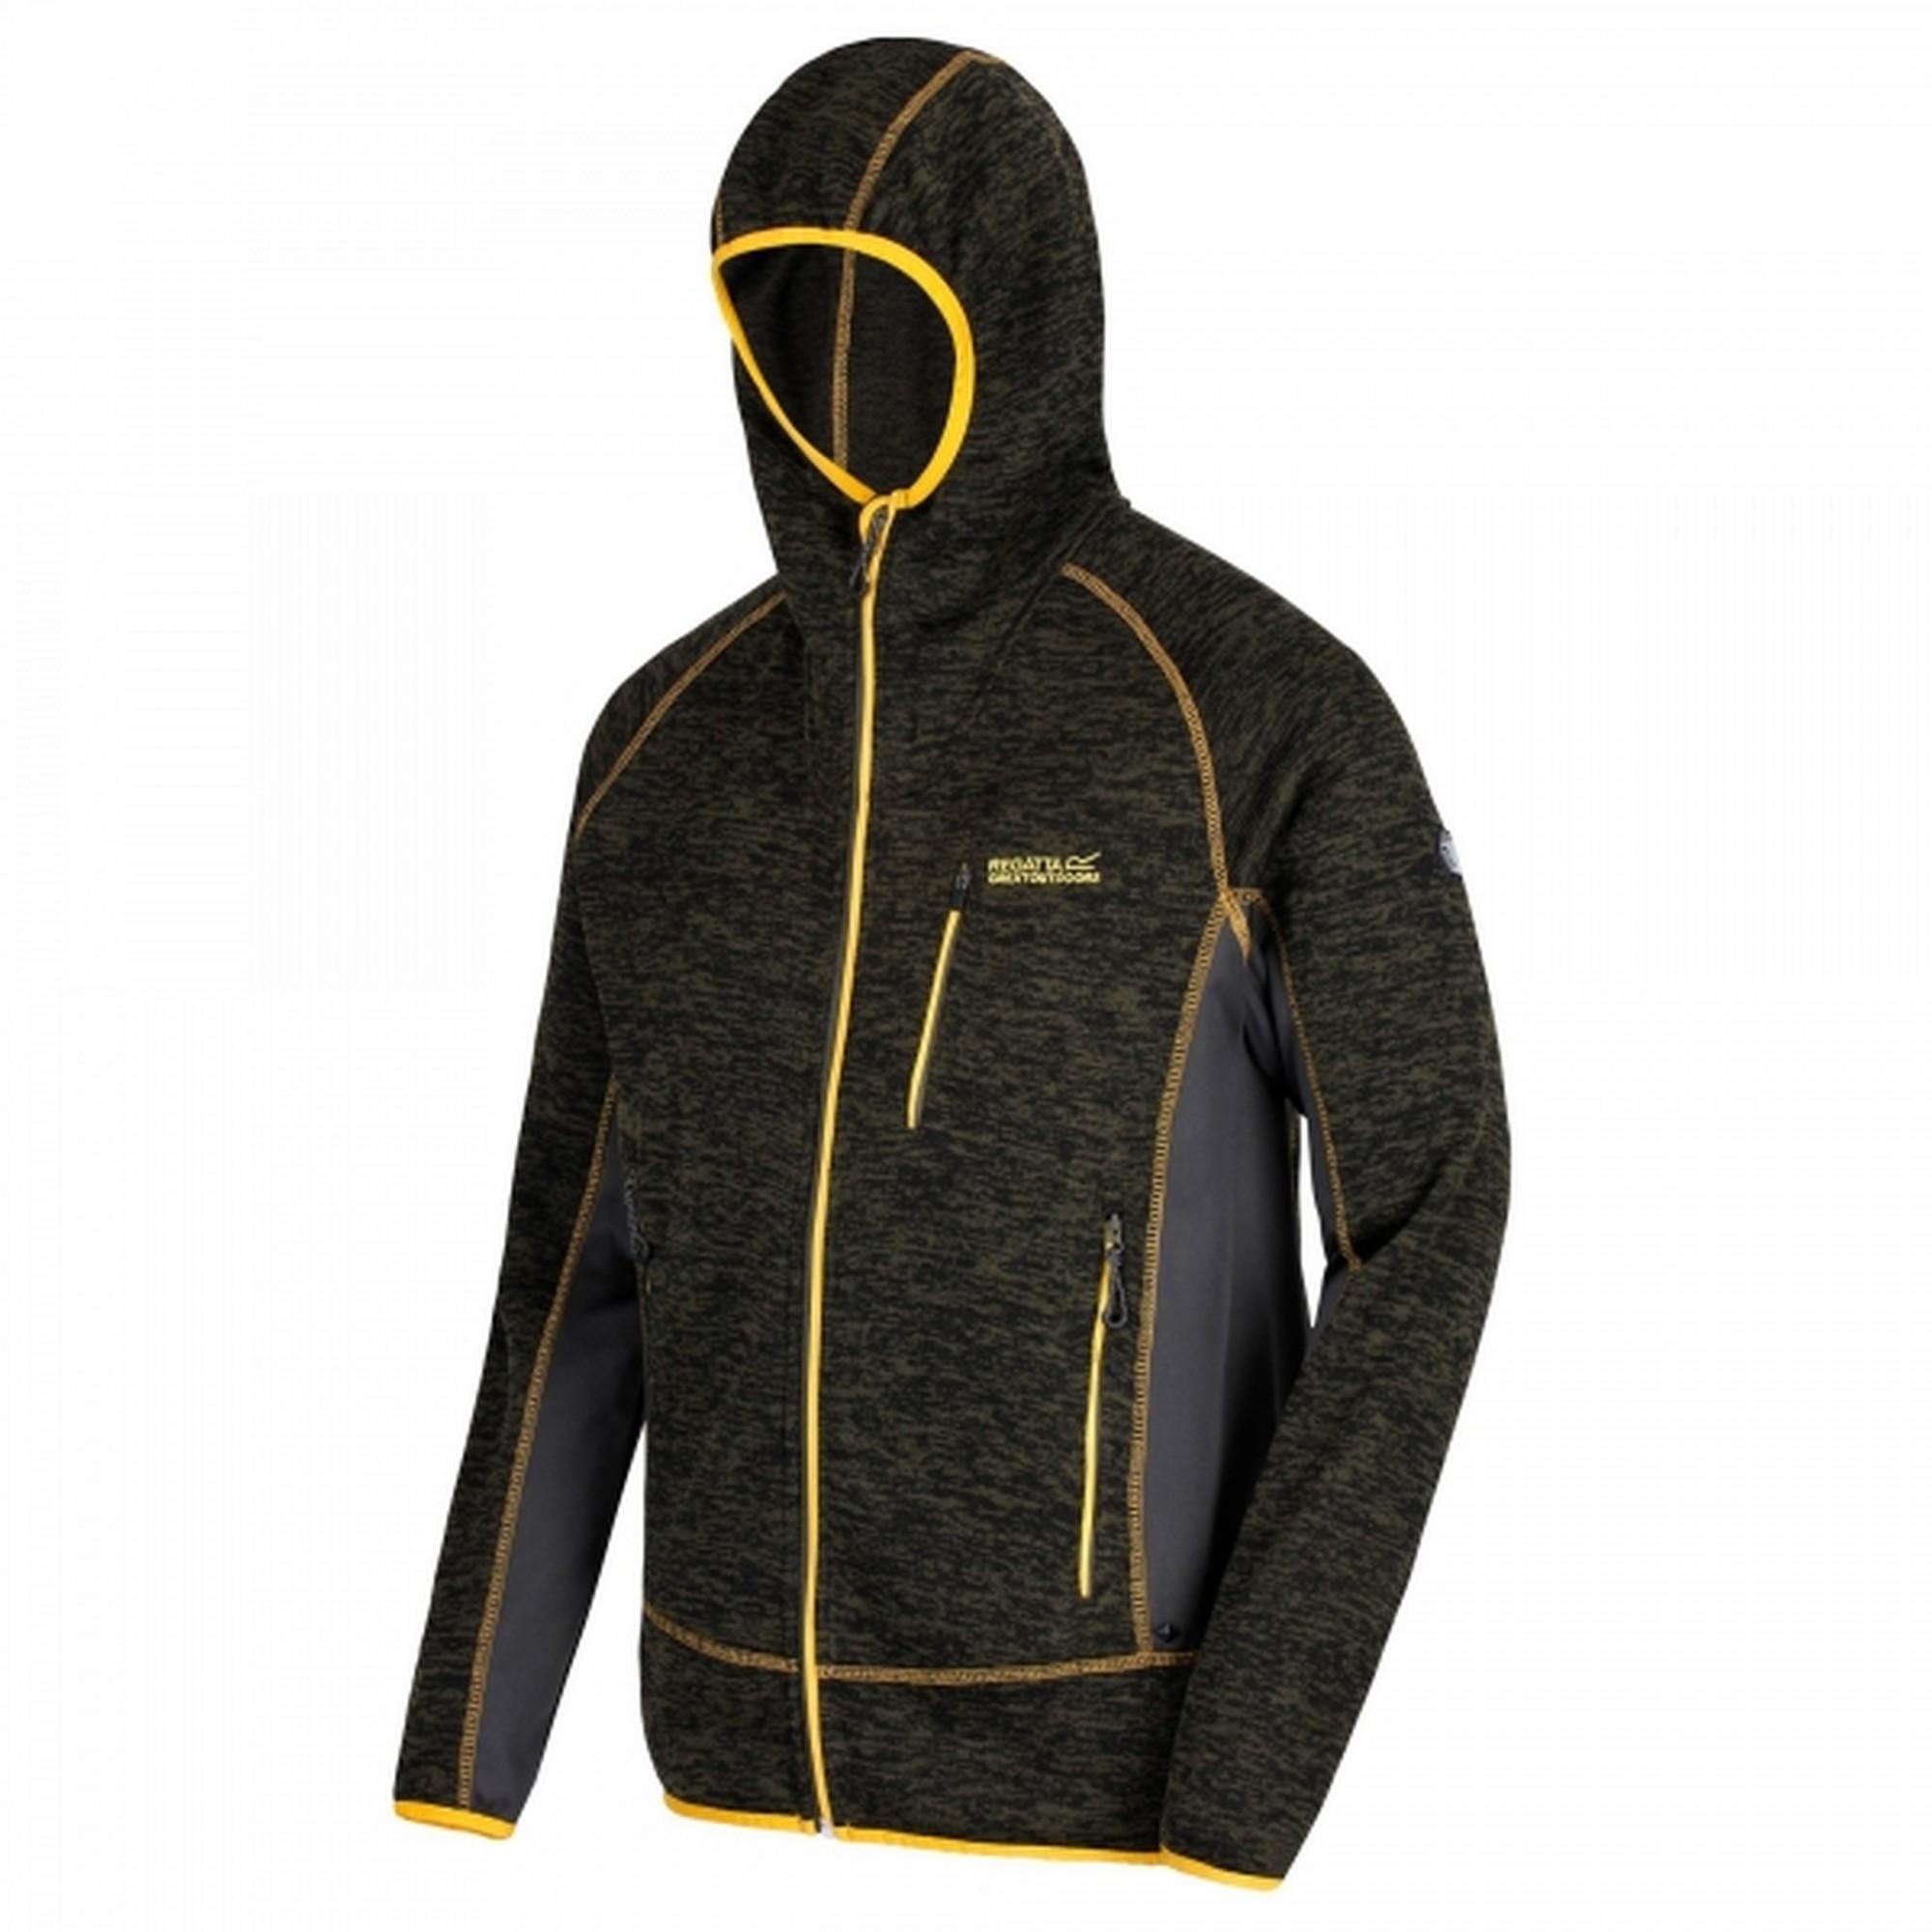 Regatta Outdoorjacke | Sportbekleidung > Sportjacken > Outdoorjacken | Grau | Polyester - Fleece | Regatta